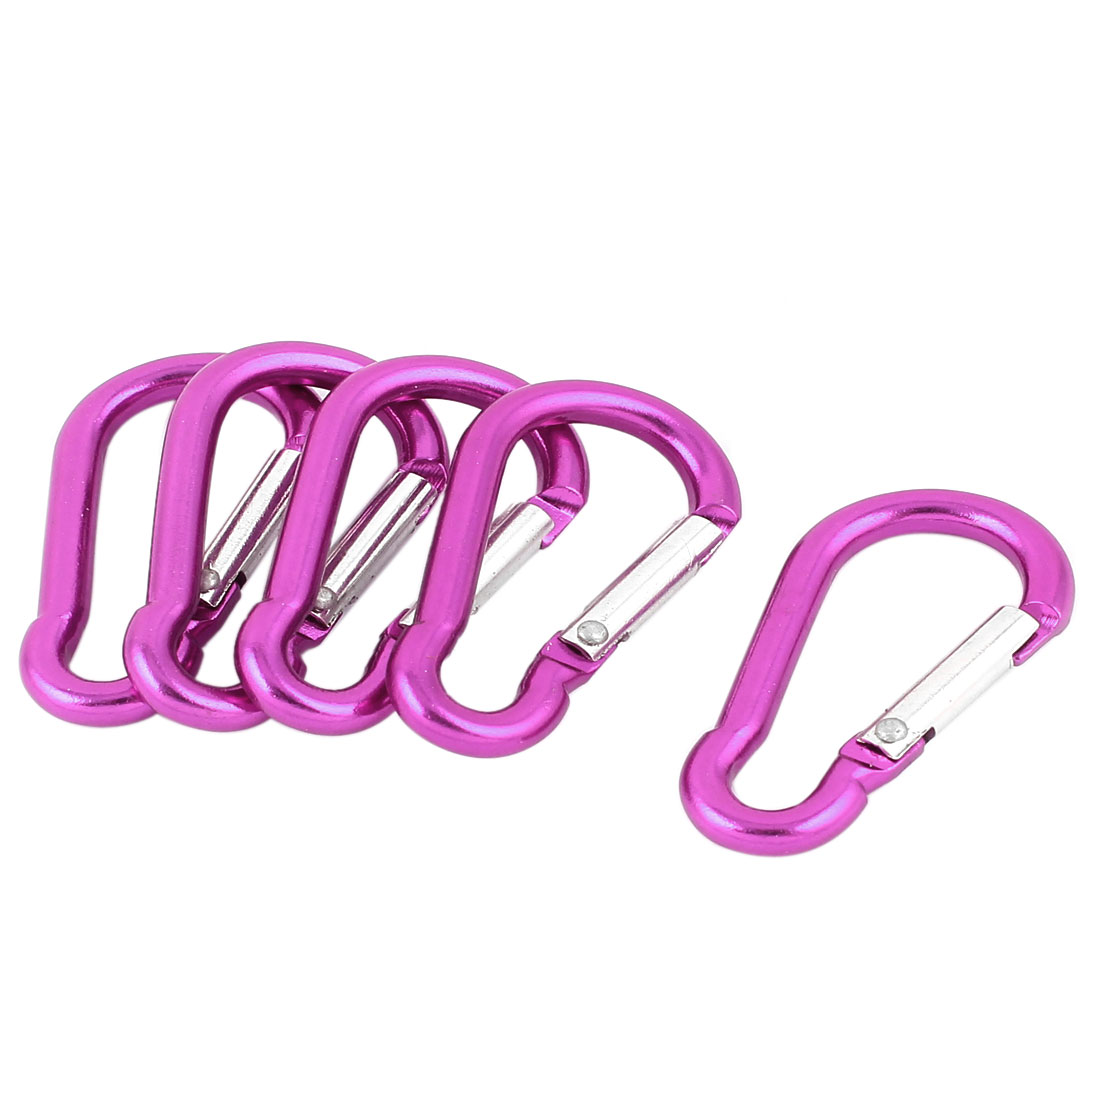 Travel Camping Hiking Aluminum Clip Hook D-Ring Keychain Carabiner 5 Pcs Fuchsia